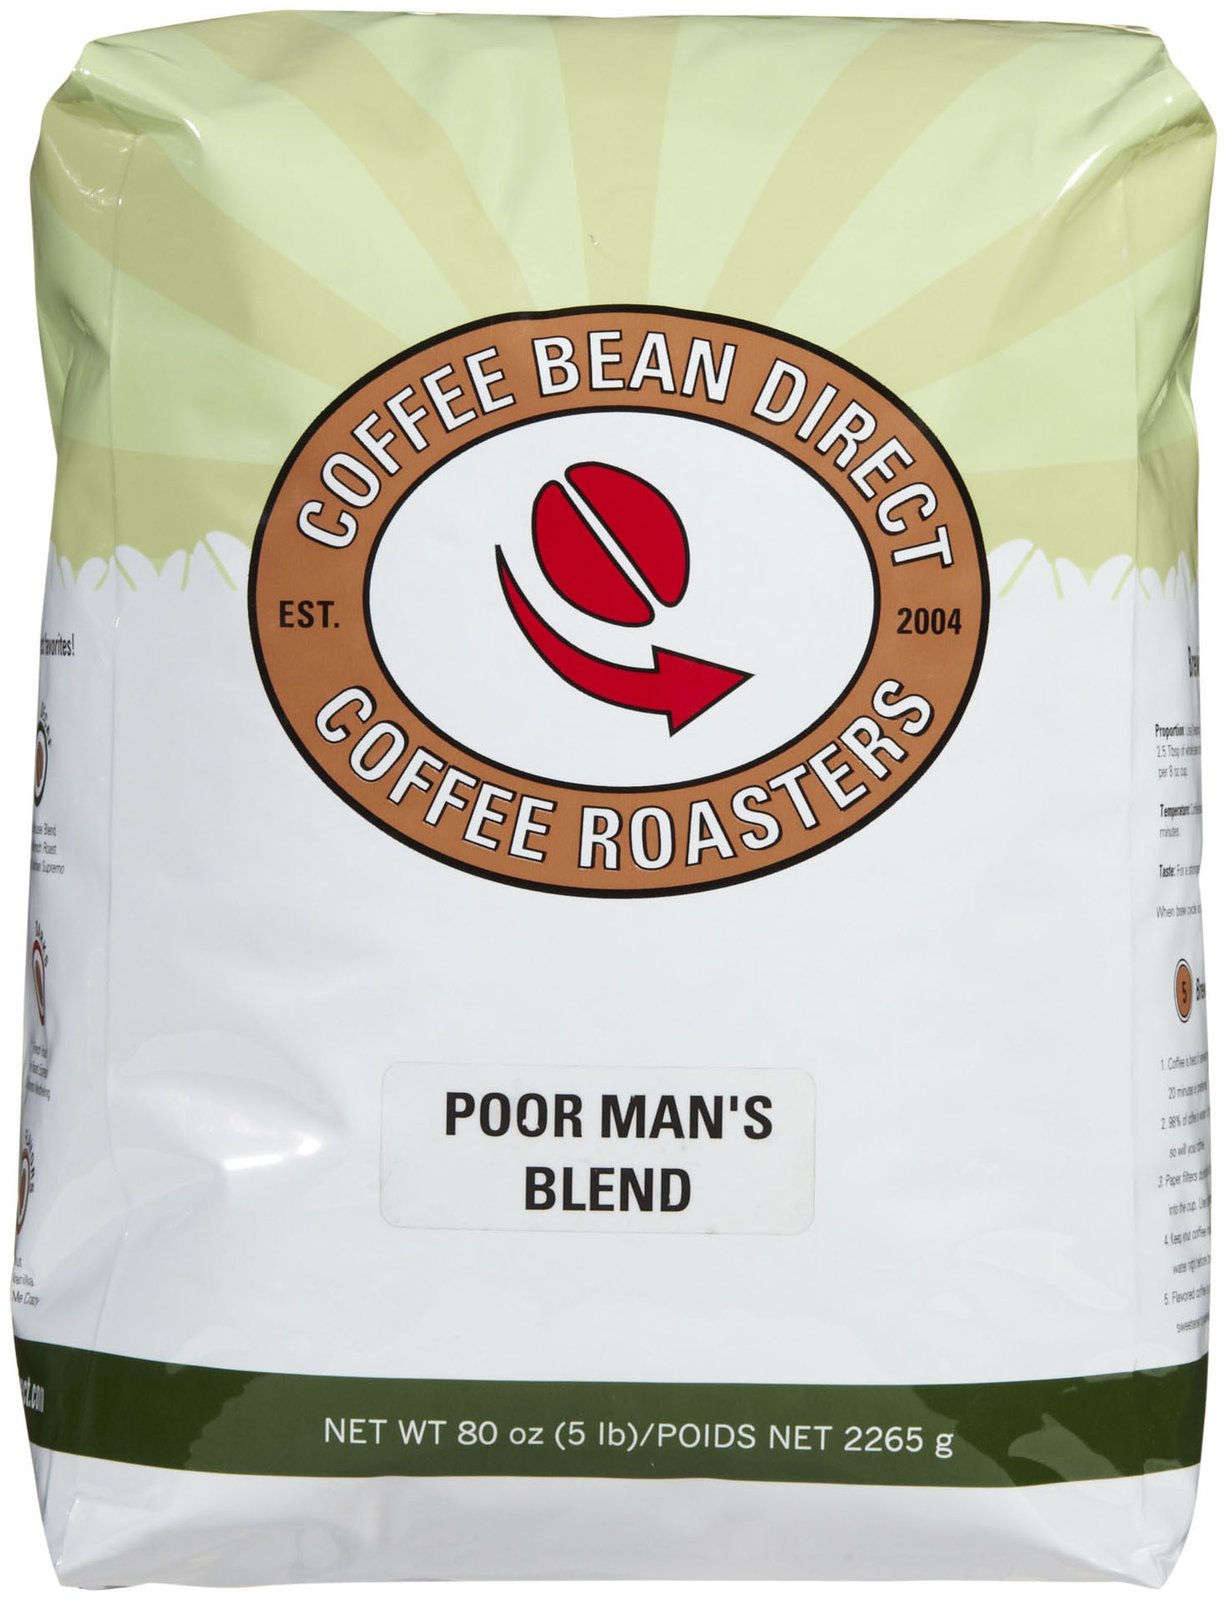 Coffee Bean Direct Poor Man's Blend, Whole Bean Coffee, 5 lb bag